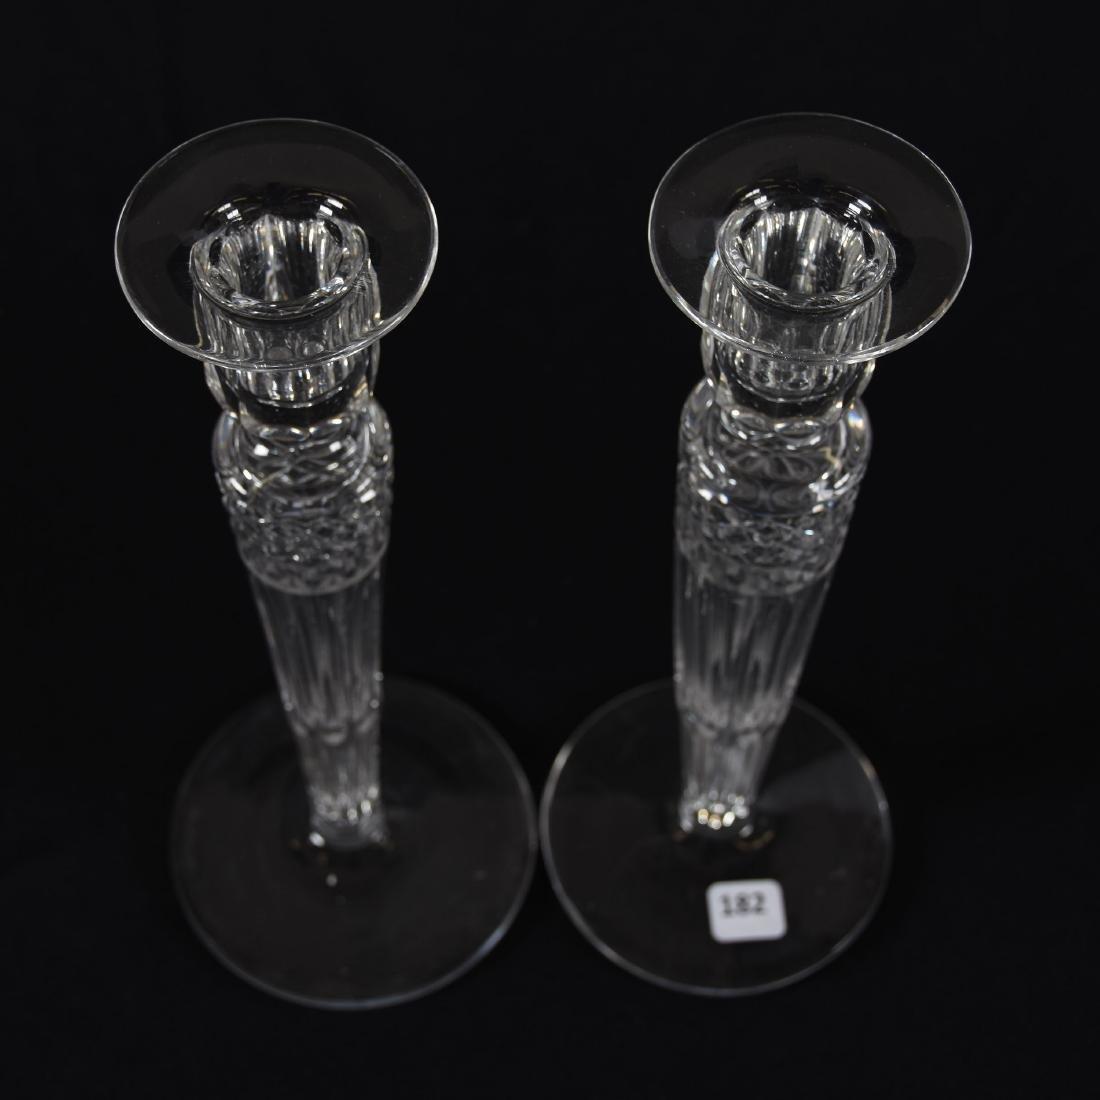 Pair Candlesticks, Signed Hawkes, Hollow Stem Diamond - 2